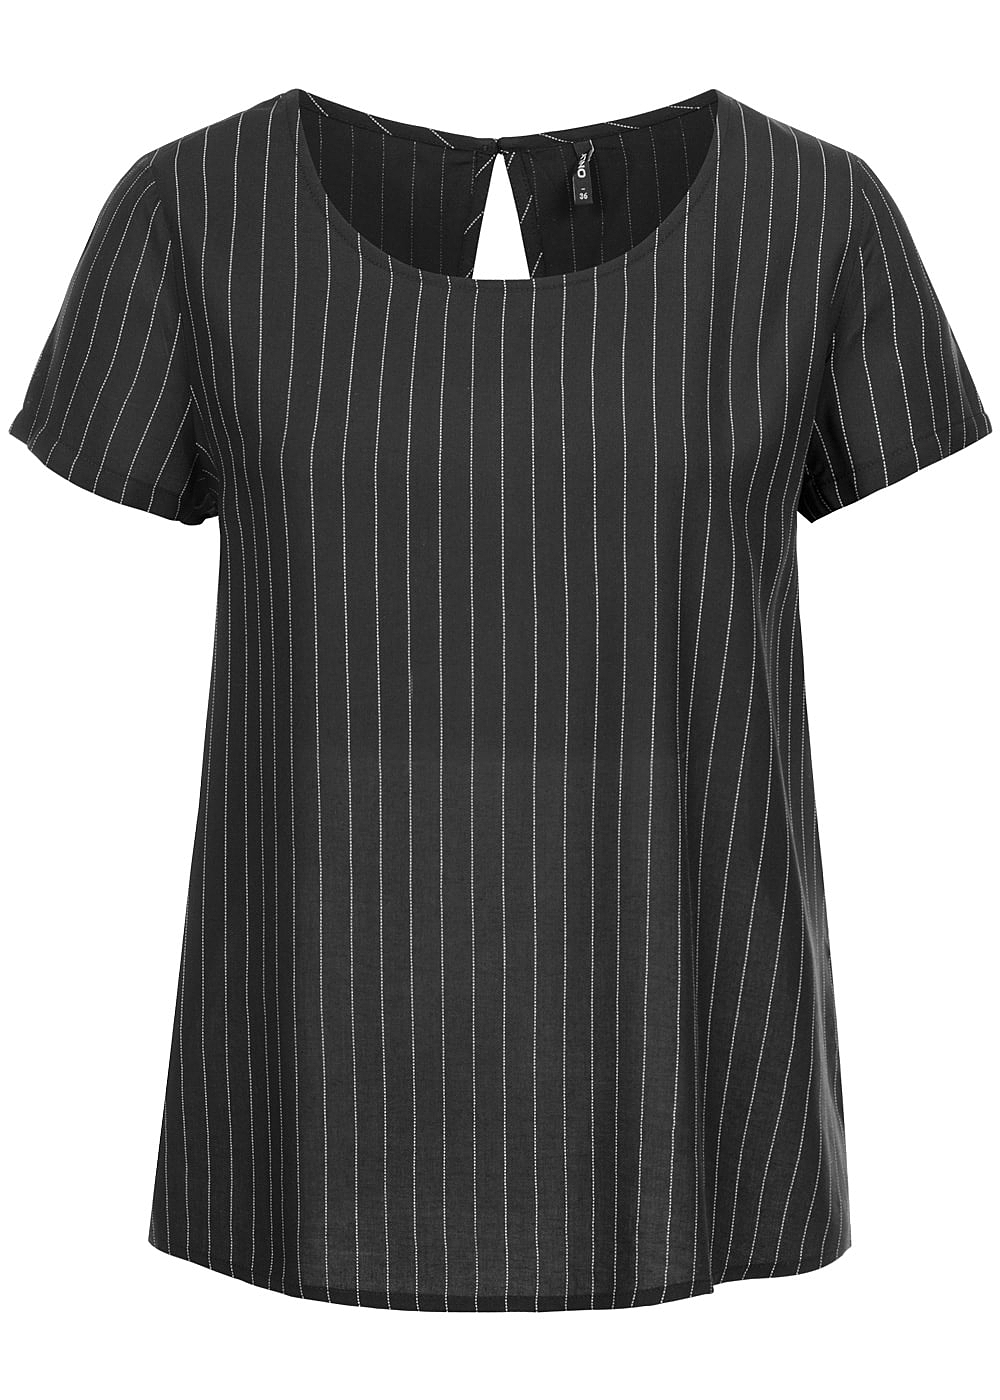 only damen blusen top gestreift noos schwarz weiss 77onlineshop. Black Bedroom Furniture Sets. Home Design Ideas